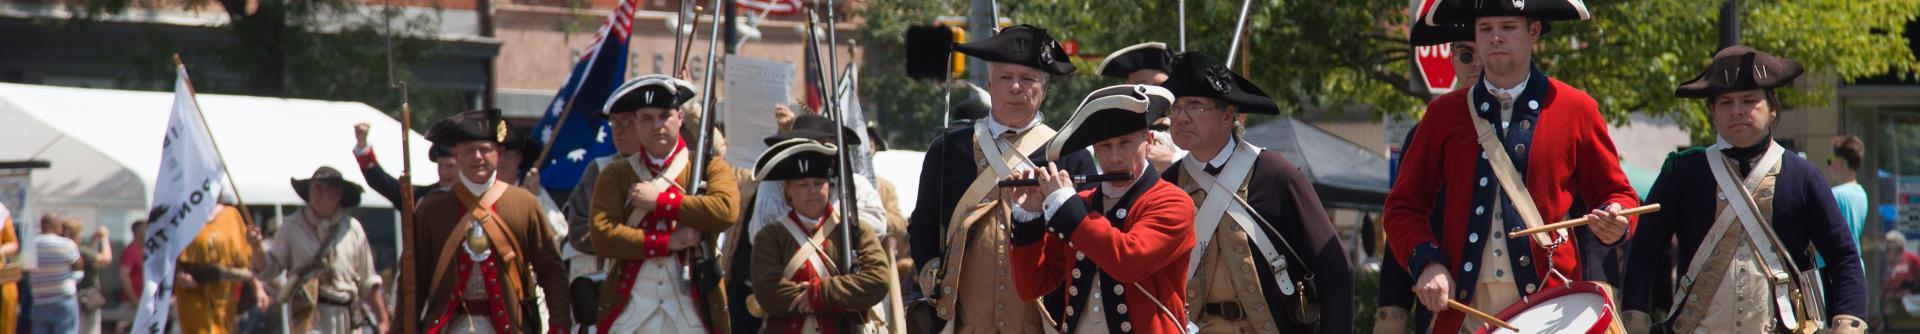 Easton Heritage Day